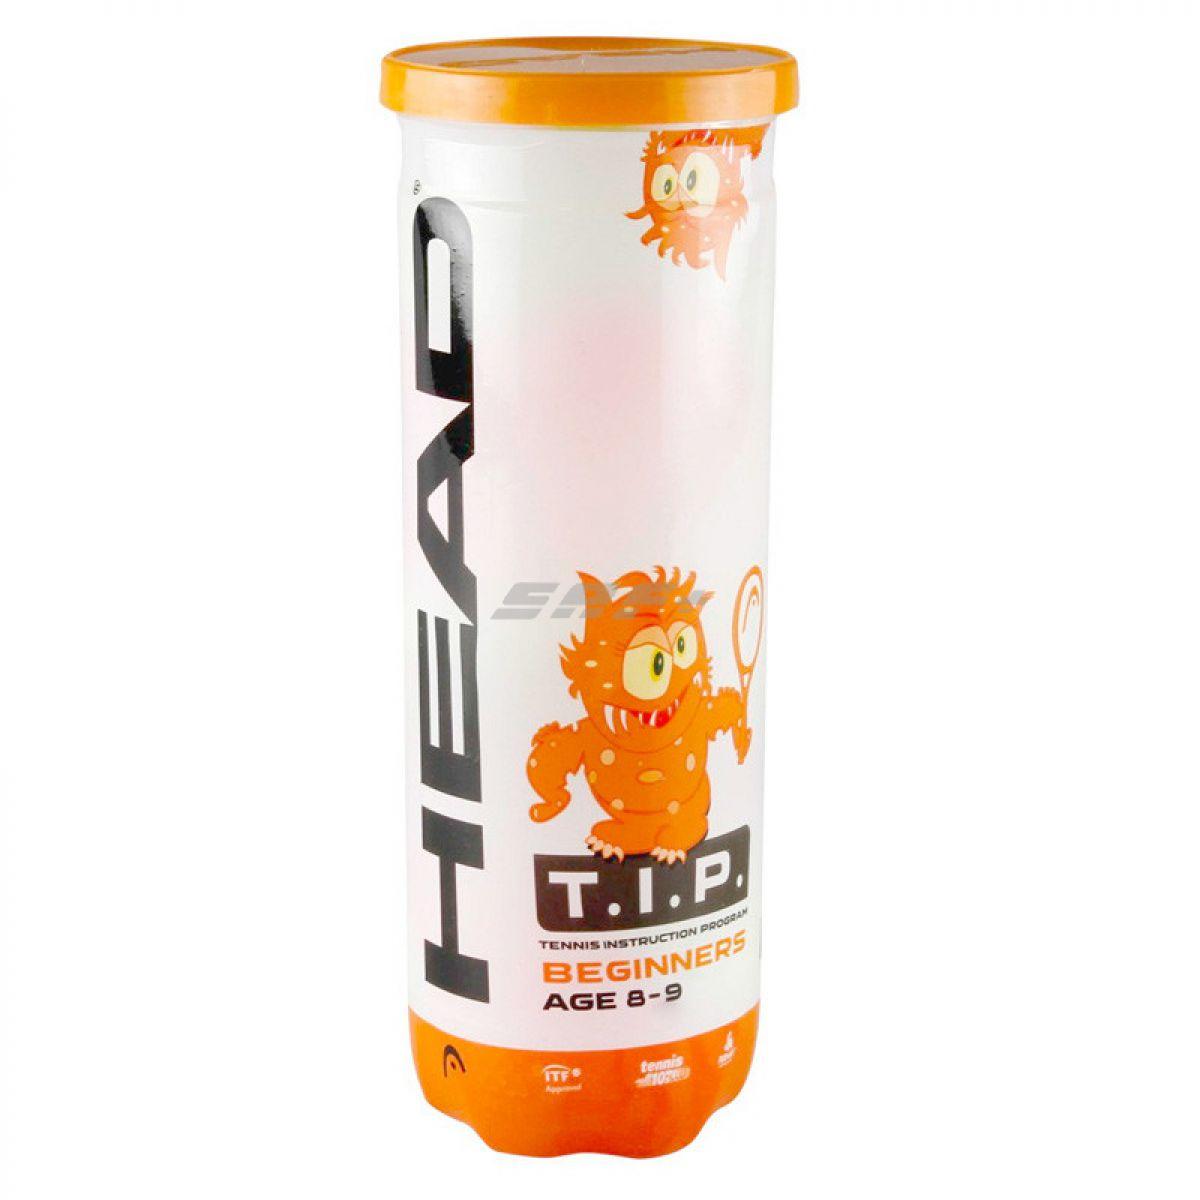 Мяч теннисный Мяч теннисный HEAD T.I.P Orange, арт.578123,уп.3 шт, фетр,нат.резина,желто-оранжевый